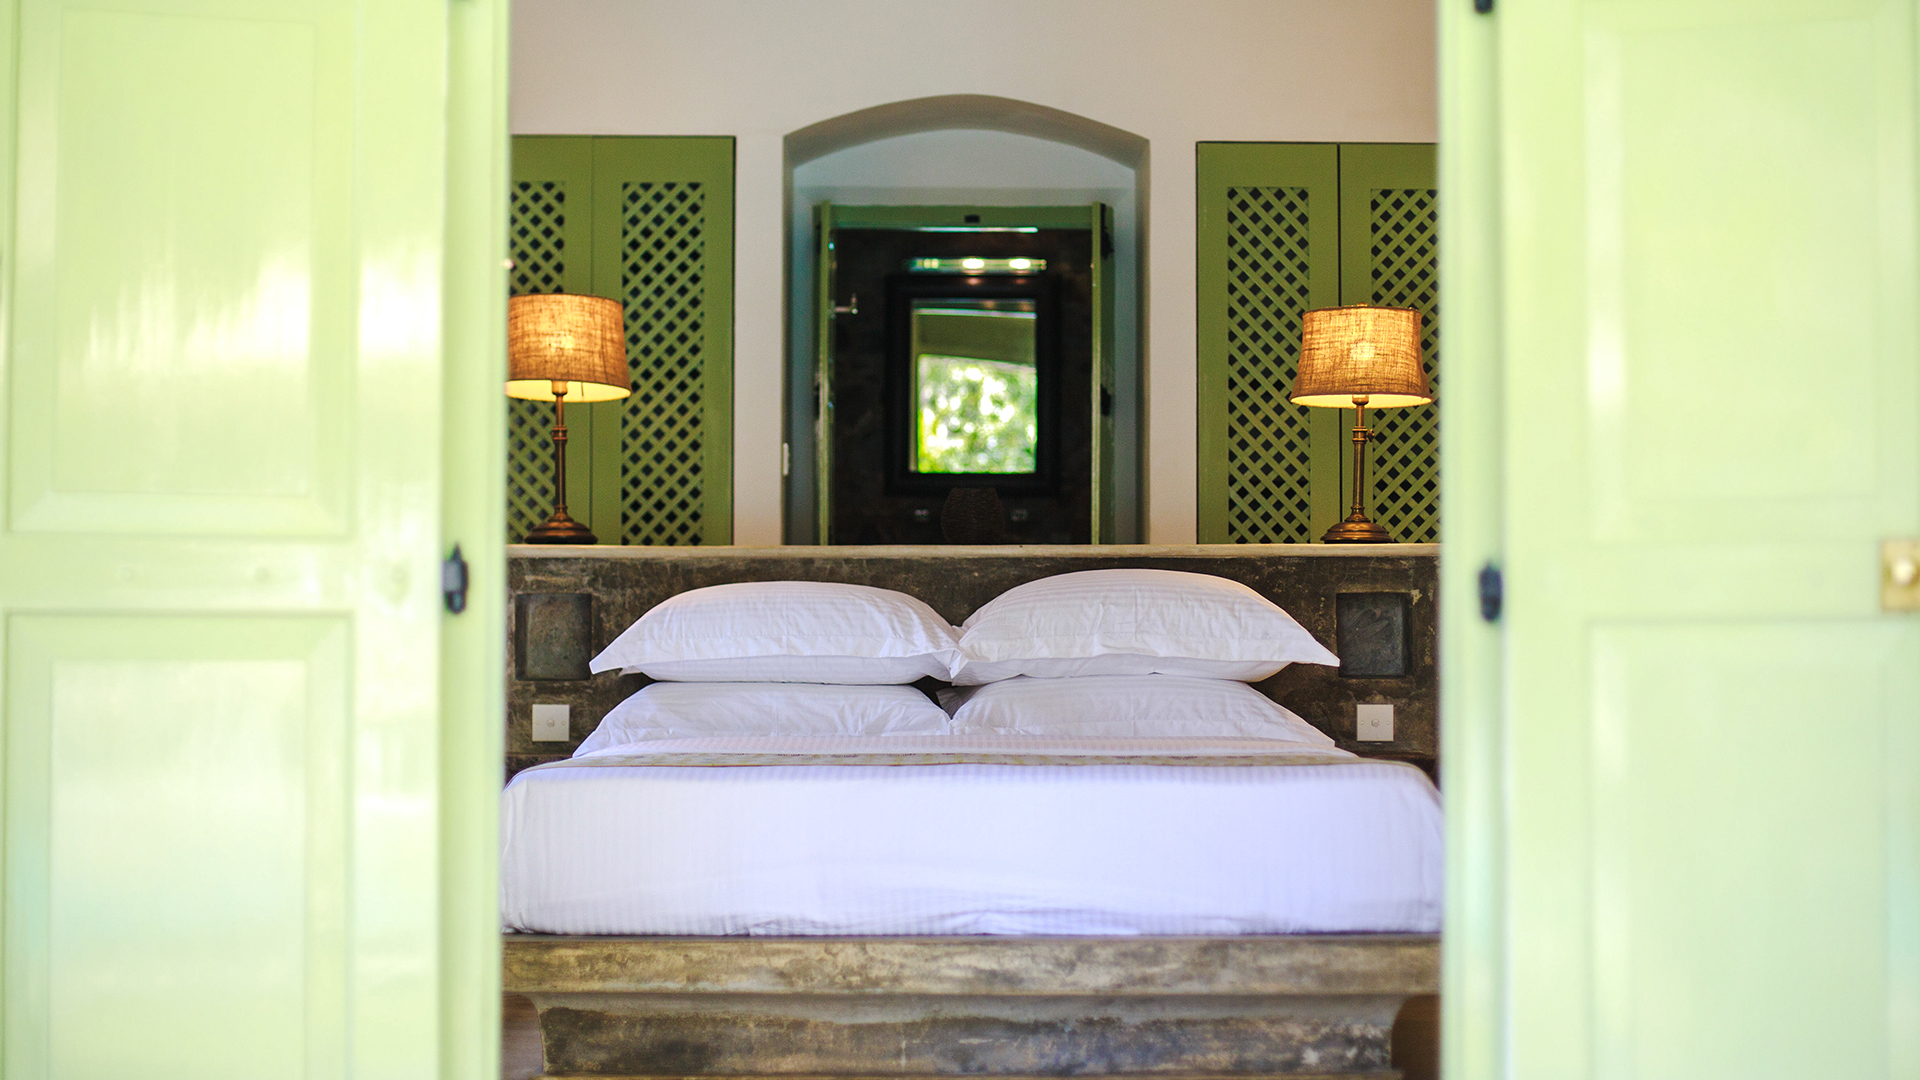 Sri_lanka_holiday_villa_gab_family_honeymoon_suiteArtboard 1 copy 3_1.jpg